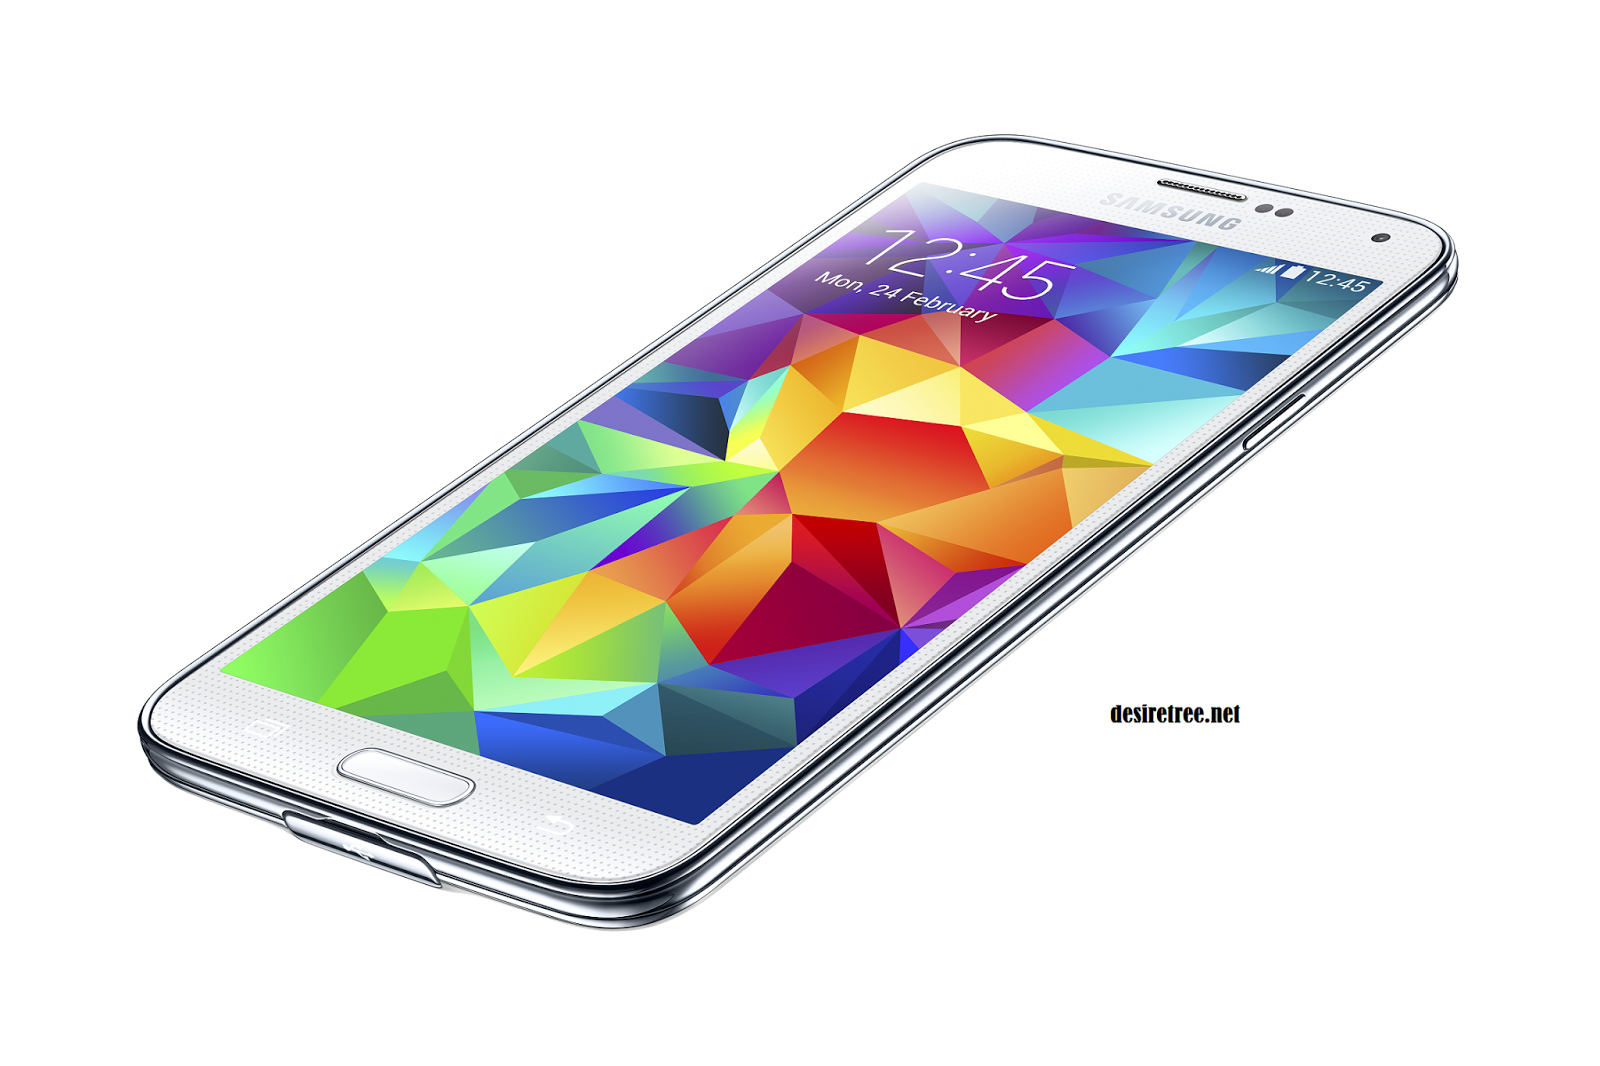 best smartphone 2015 galaxy s5